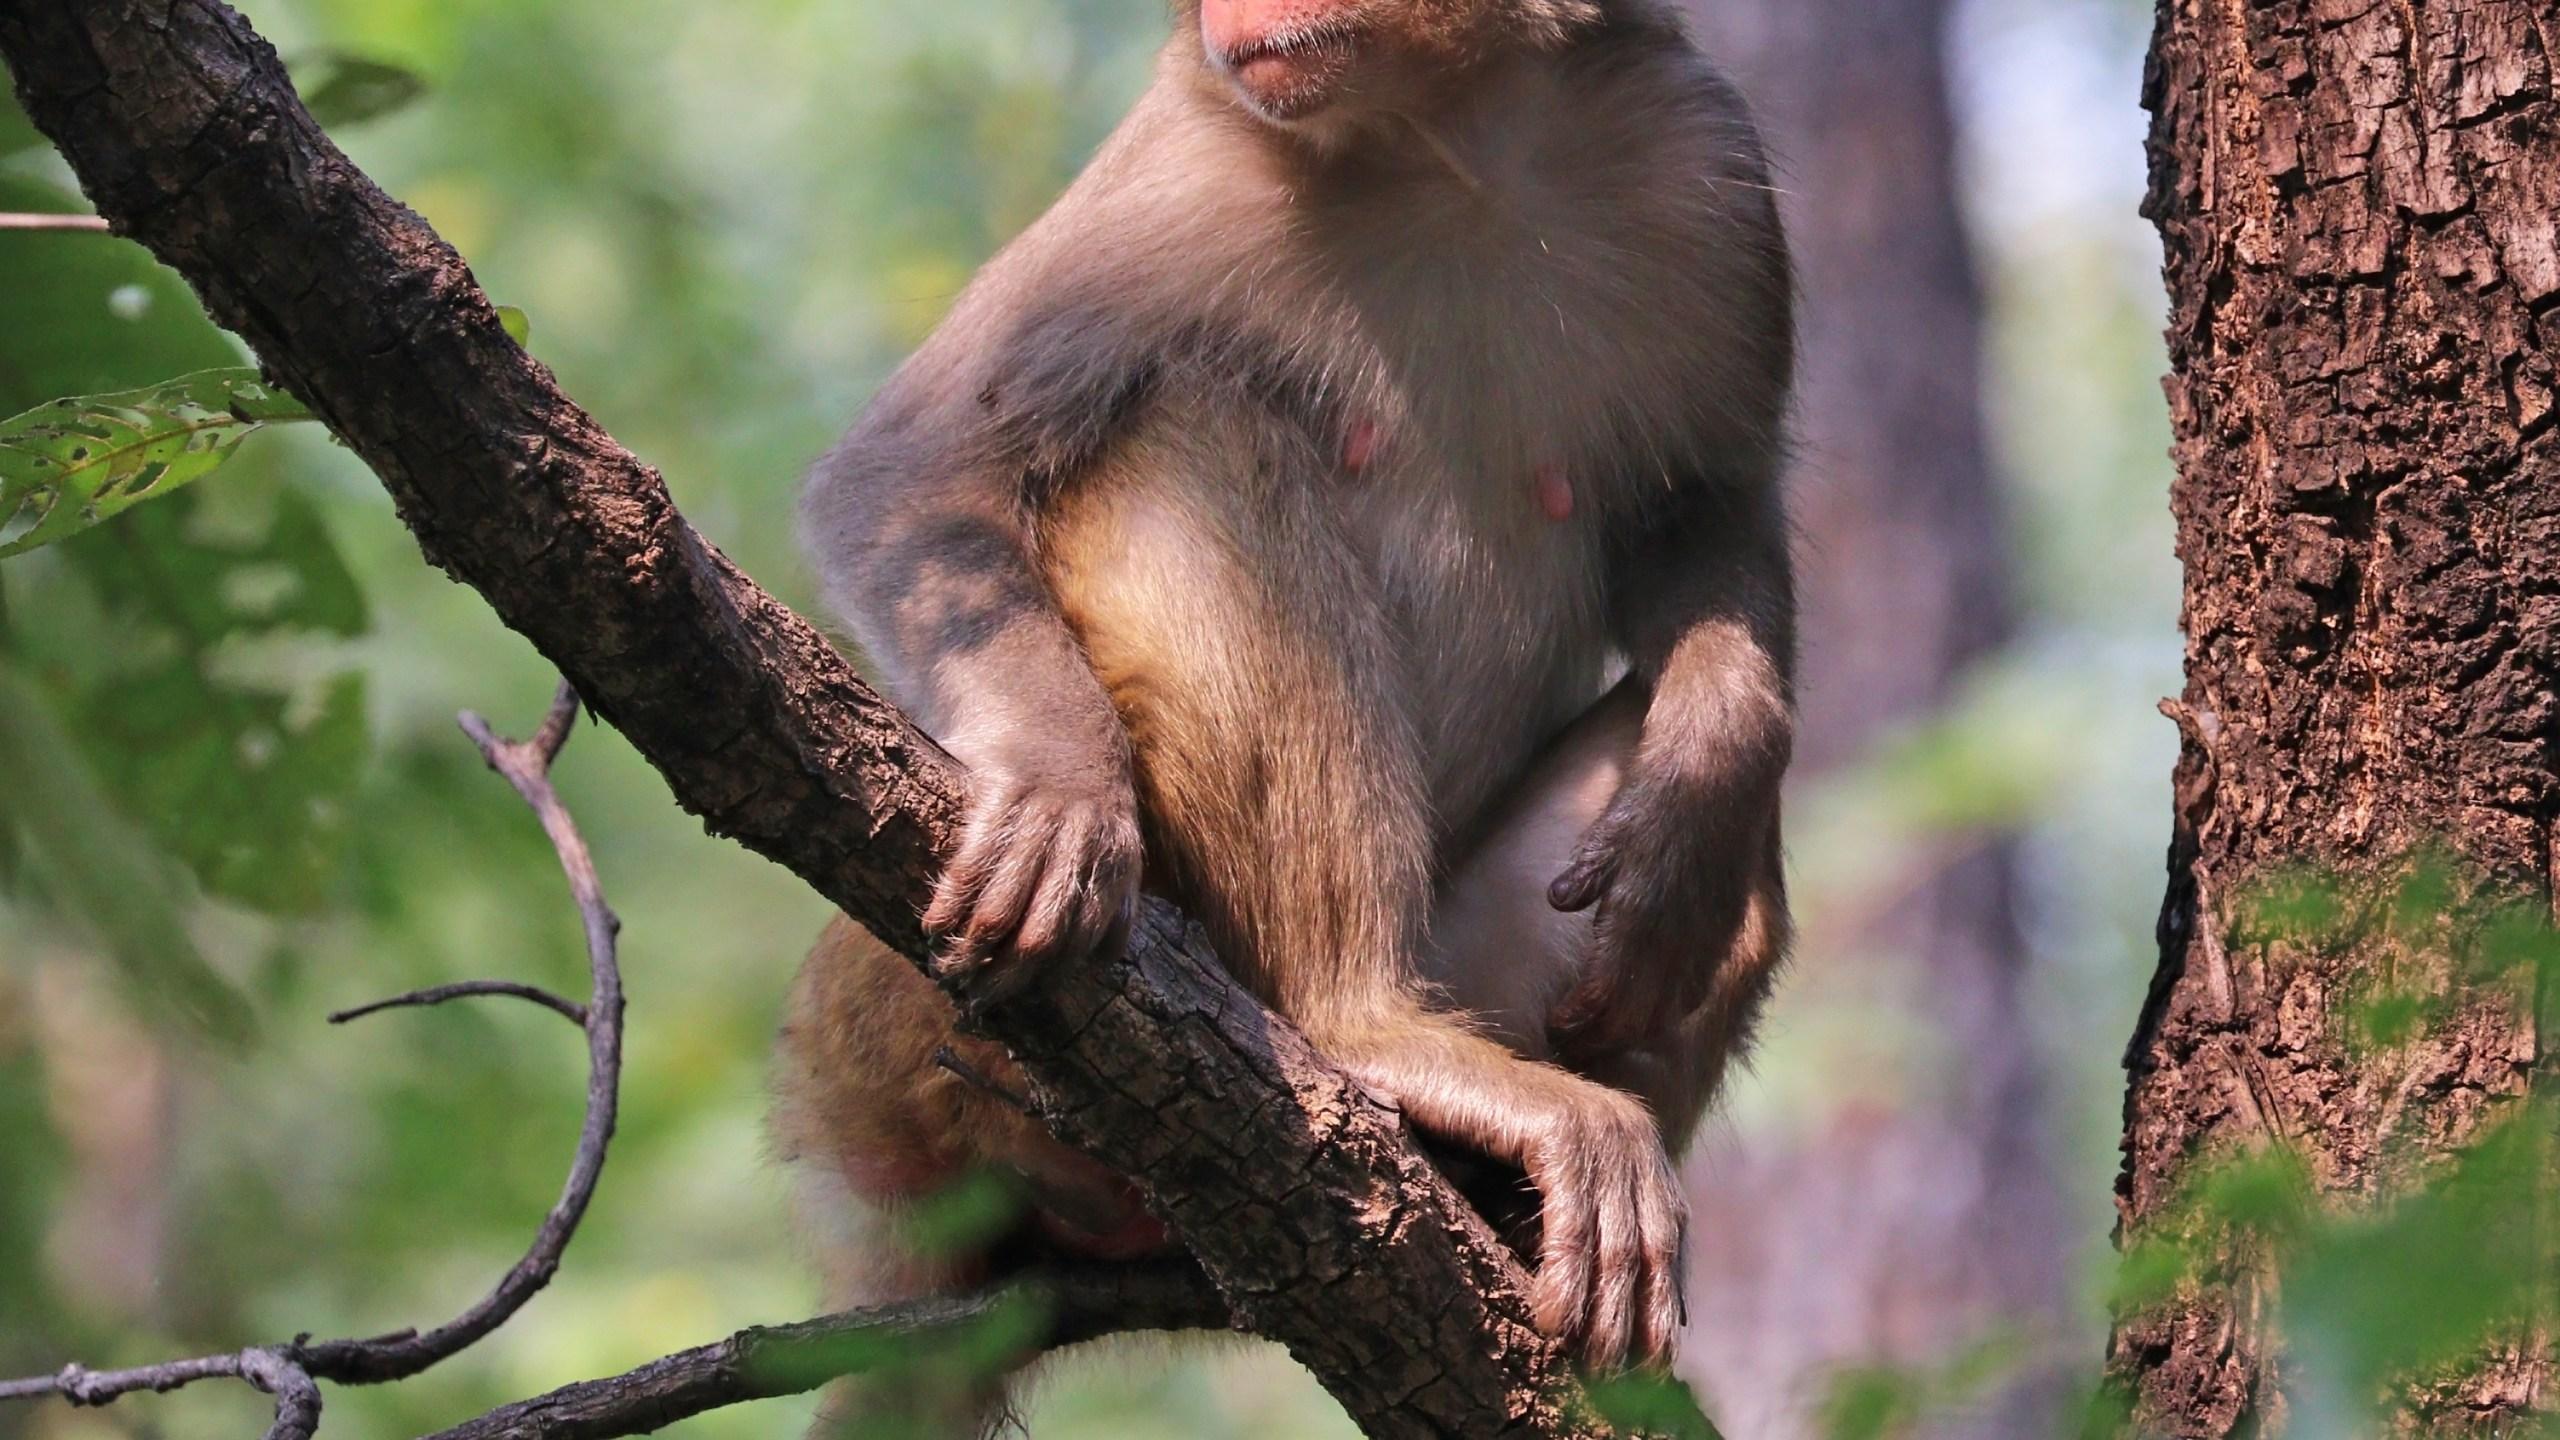 Rhesus_macaque_(Macaca_mulatta_mulatta)_female_1537129687094.jpg